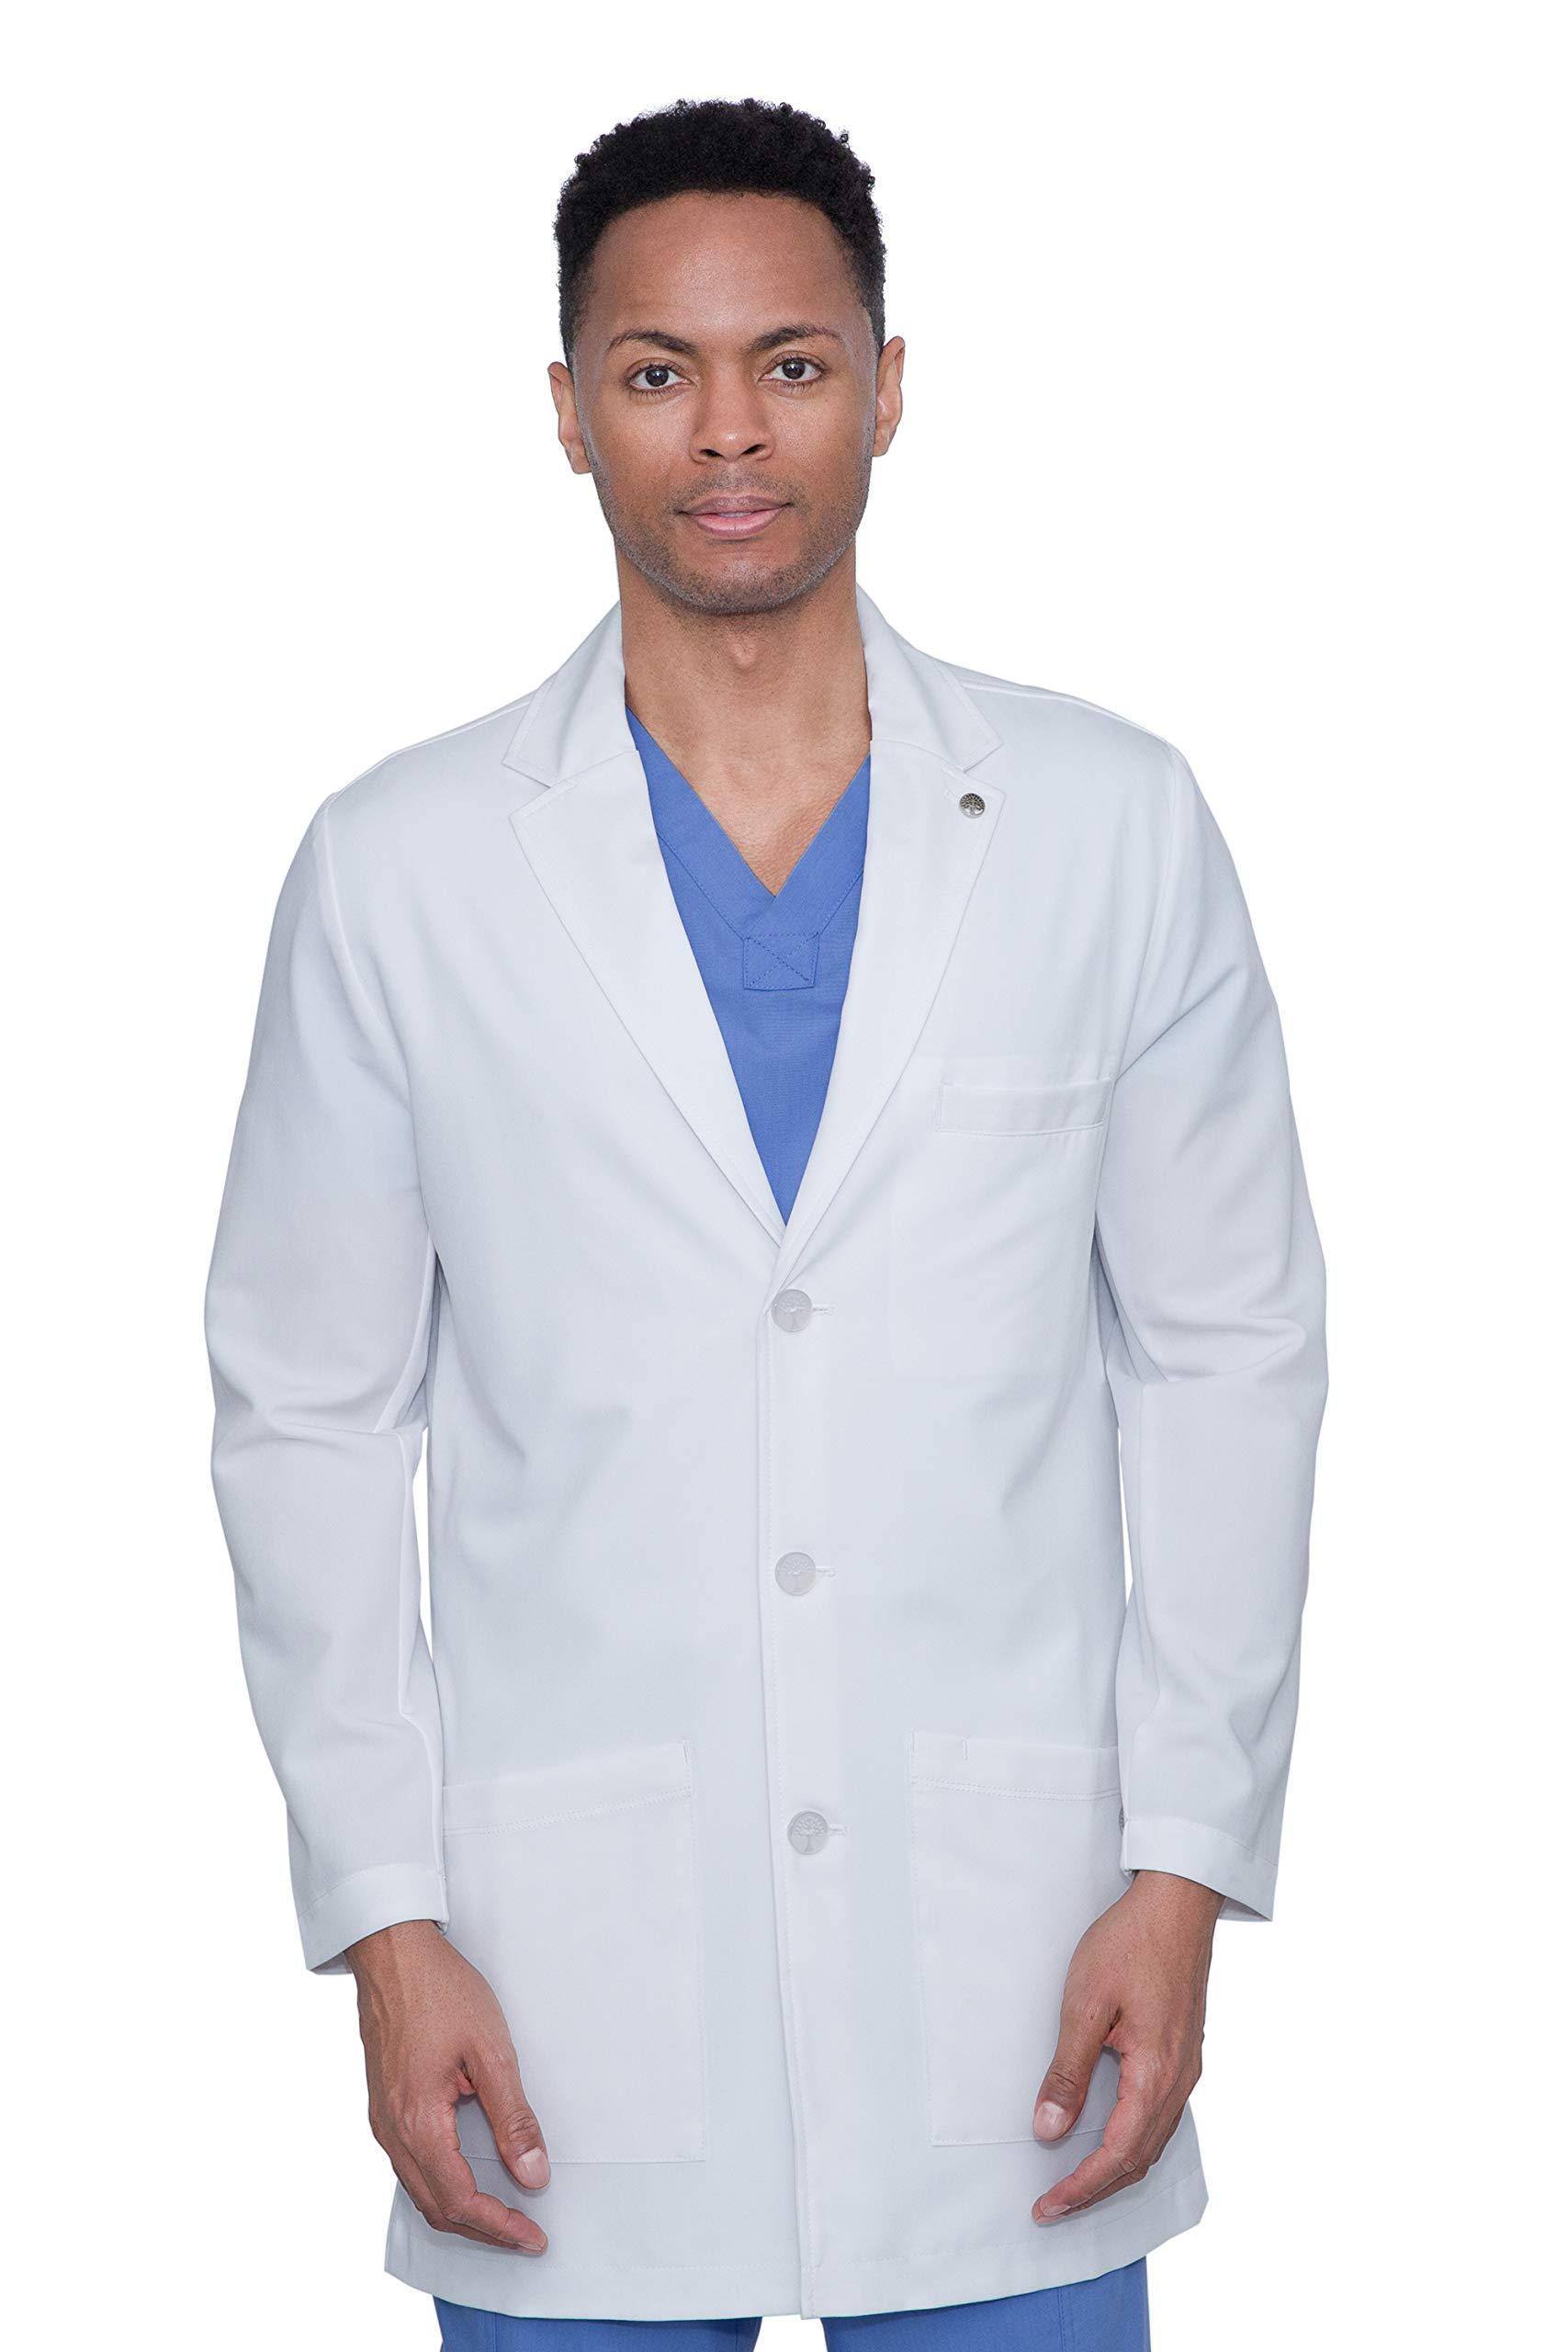 "healing hands White Coat Collection 5100"" Logan Lab Coat"